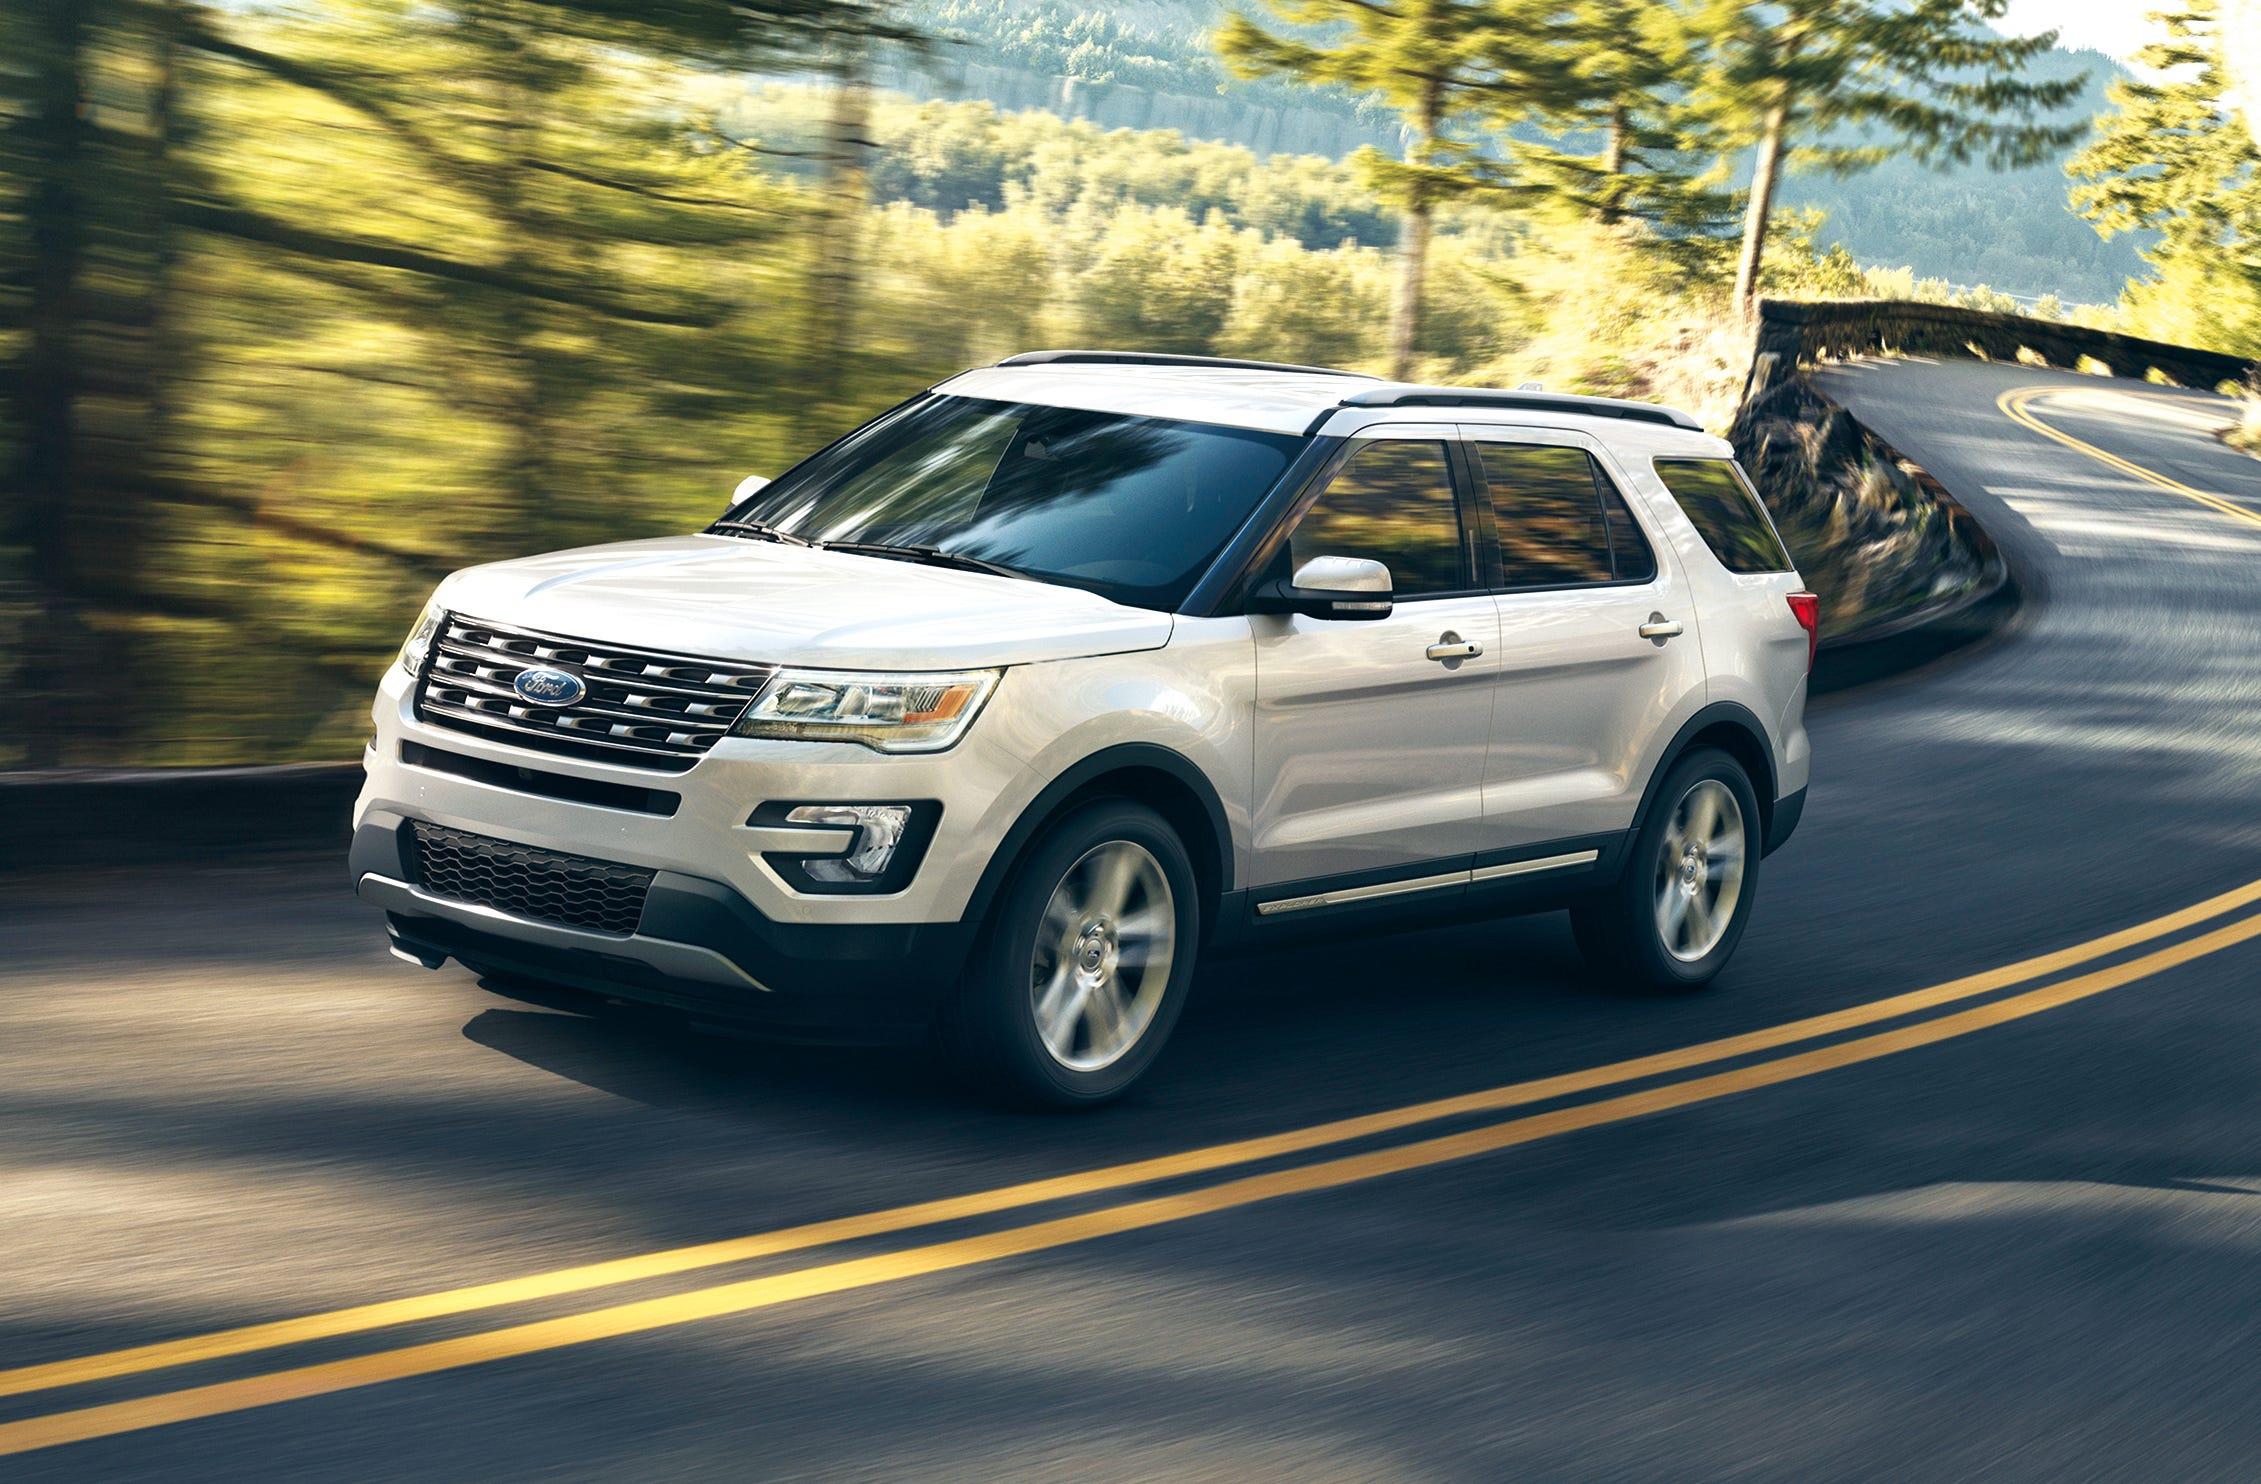 & Ford offers free repairs to address Explorer exhaust gas concerns markmcfarlin.com